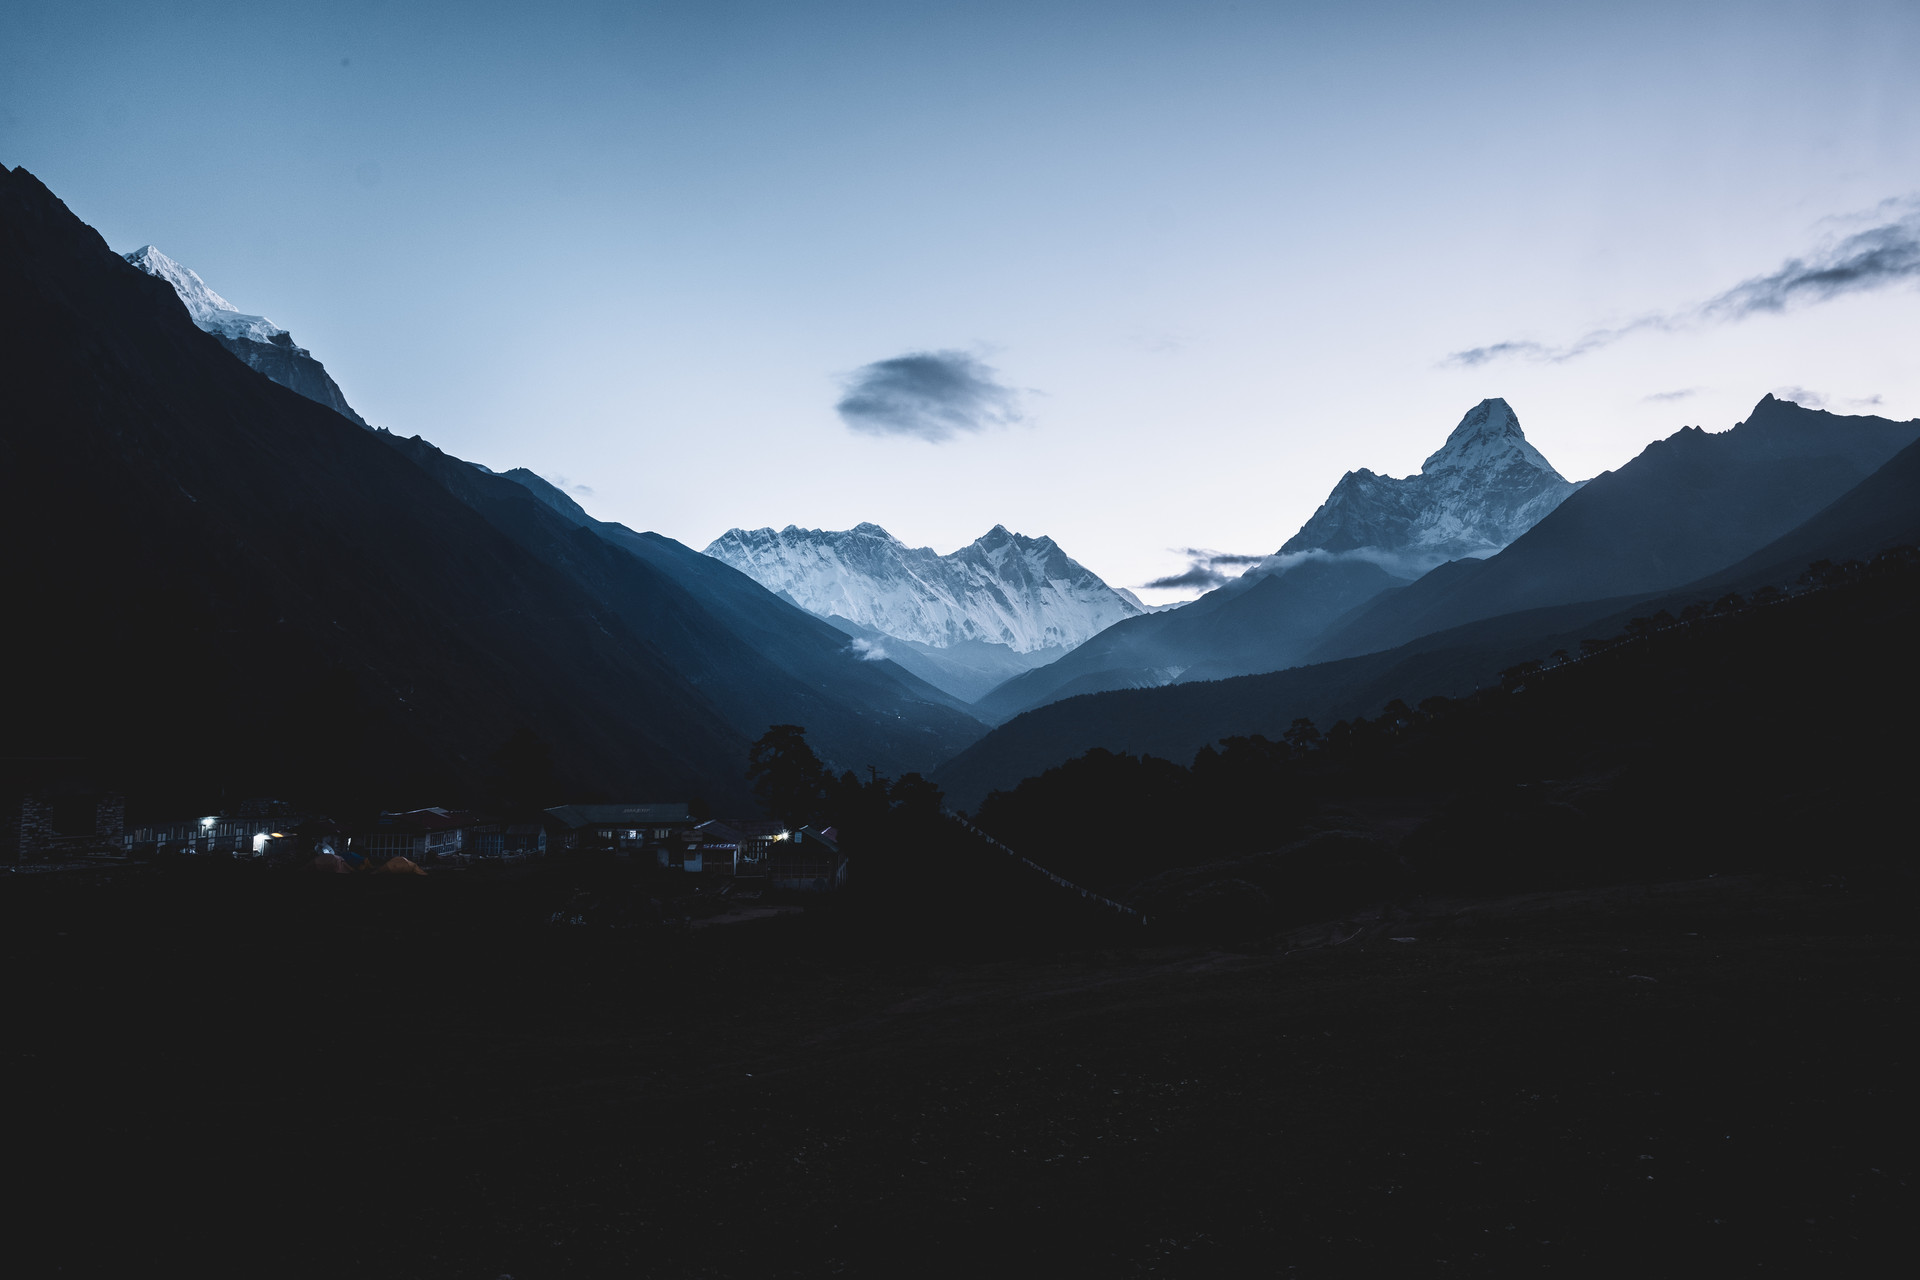 nepal_port-140139.jpg